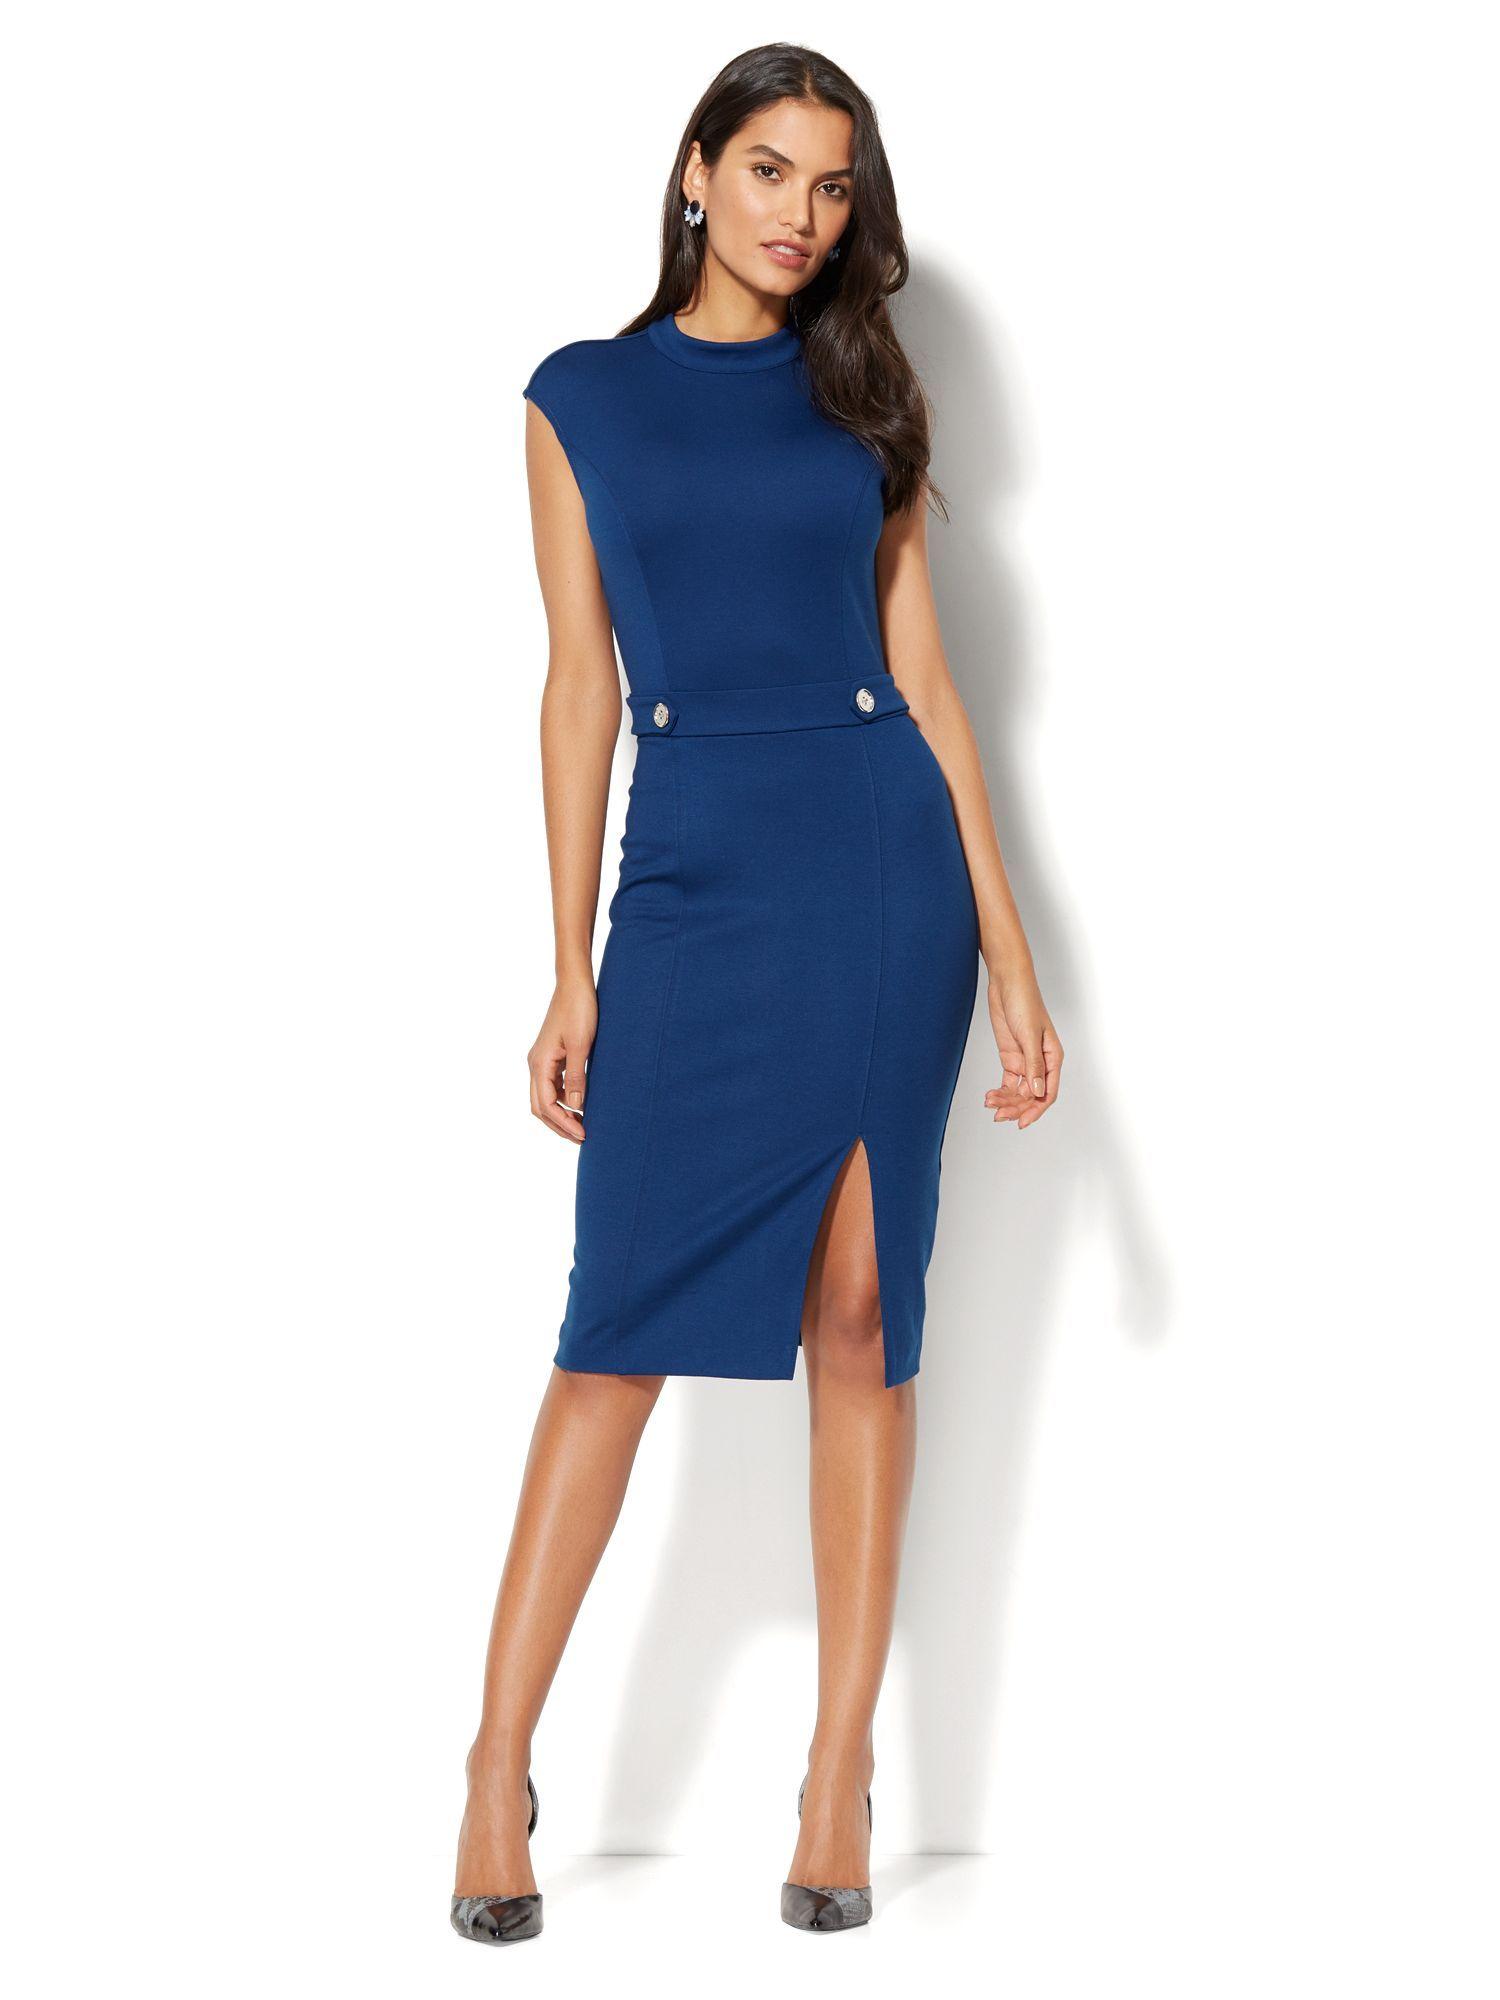 Nyandcompany Mock Neck Sheath Dress Ponte Aline Lima 06140764 704 Professional Dresses Business Dresses Dresses [ 2000 x 1500 Pixel ]